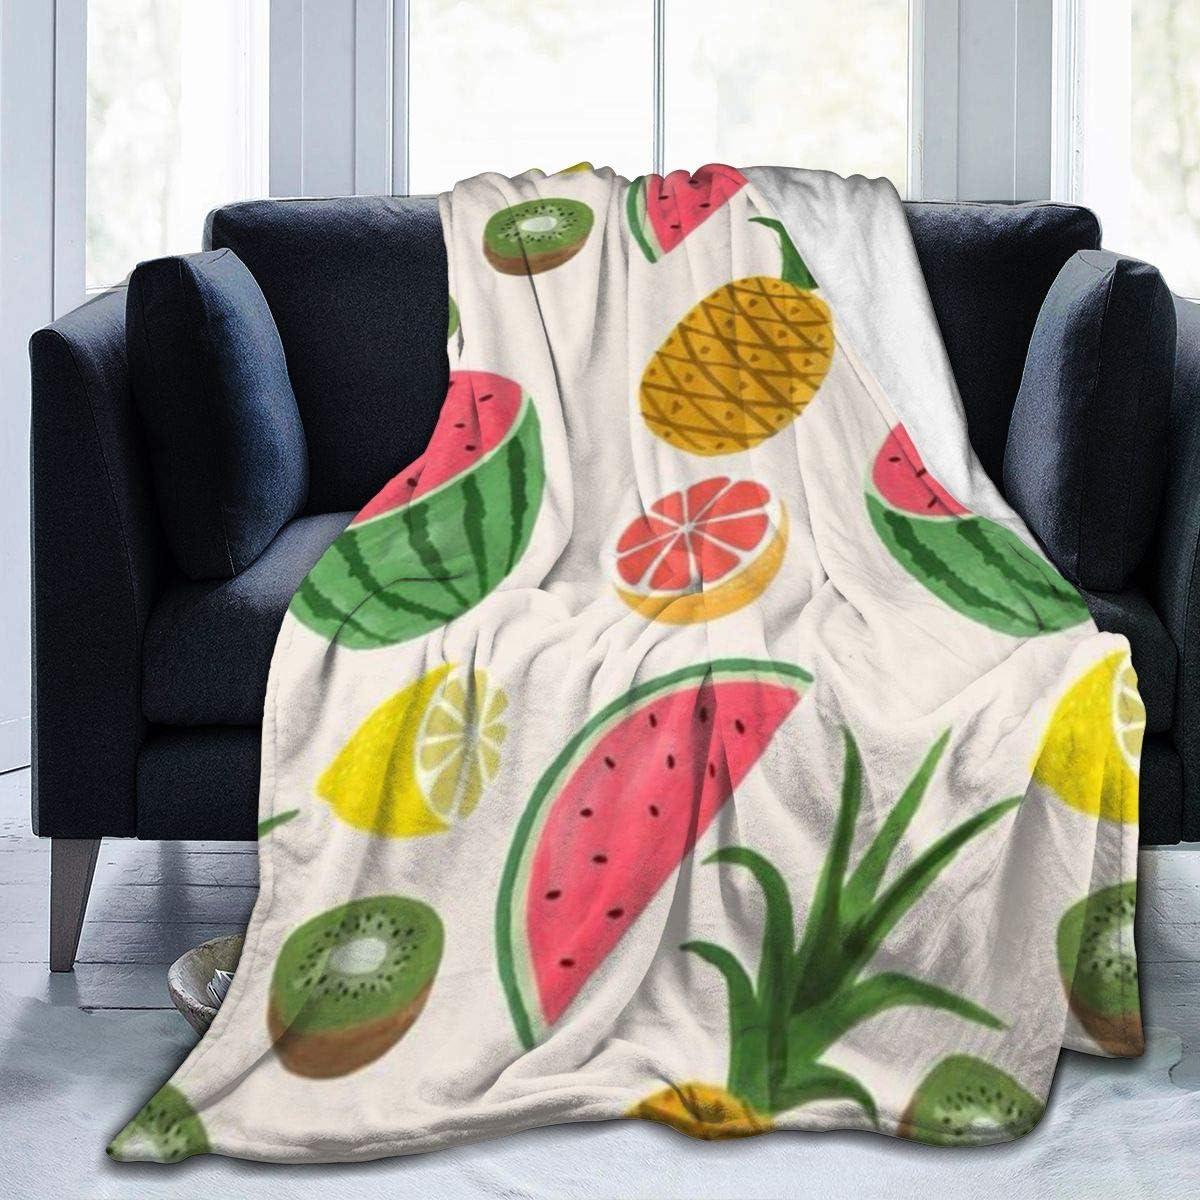 AUISS Plush Throw Velvet Blanket Watermelon Pineapple Fluffy Fleece Carpet Office Bedspreads for Kids Cozy Sleep Mat Pad Flannel Cover for All Season